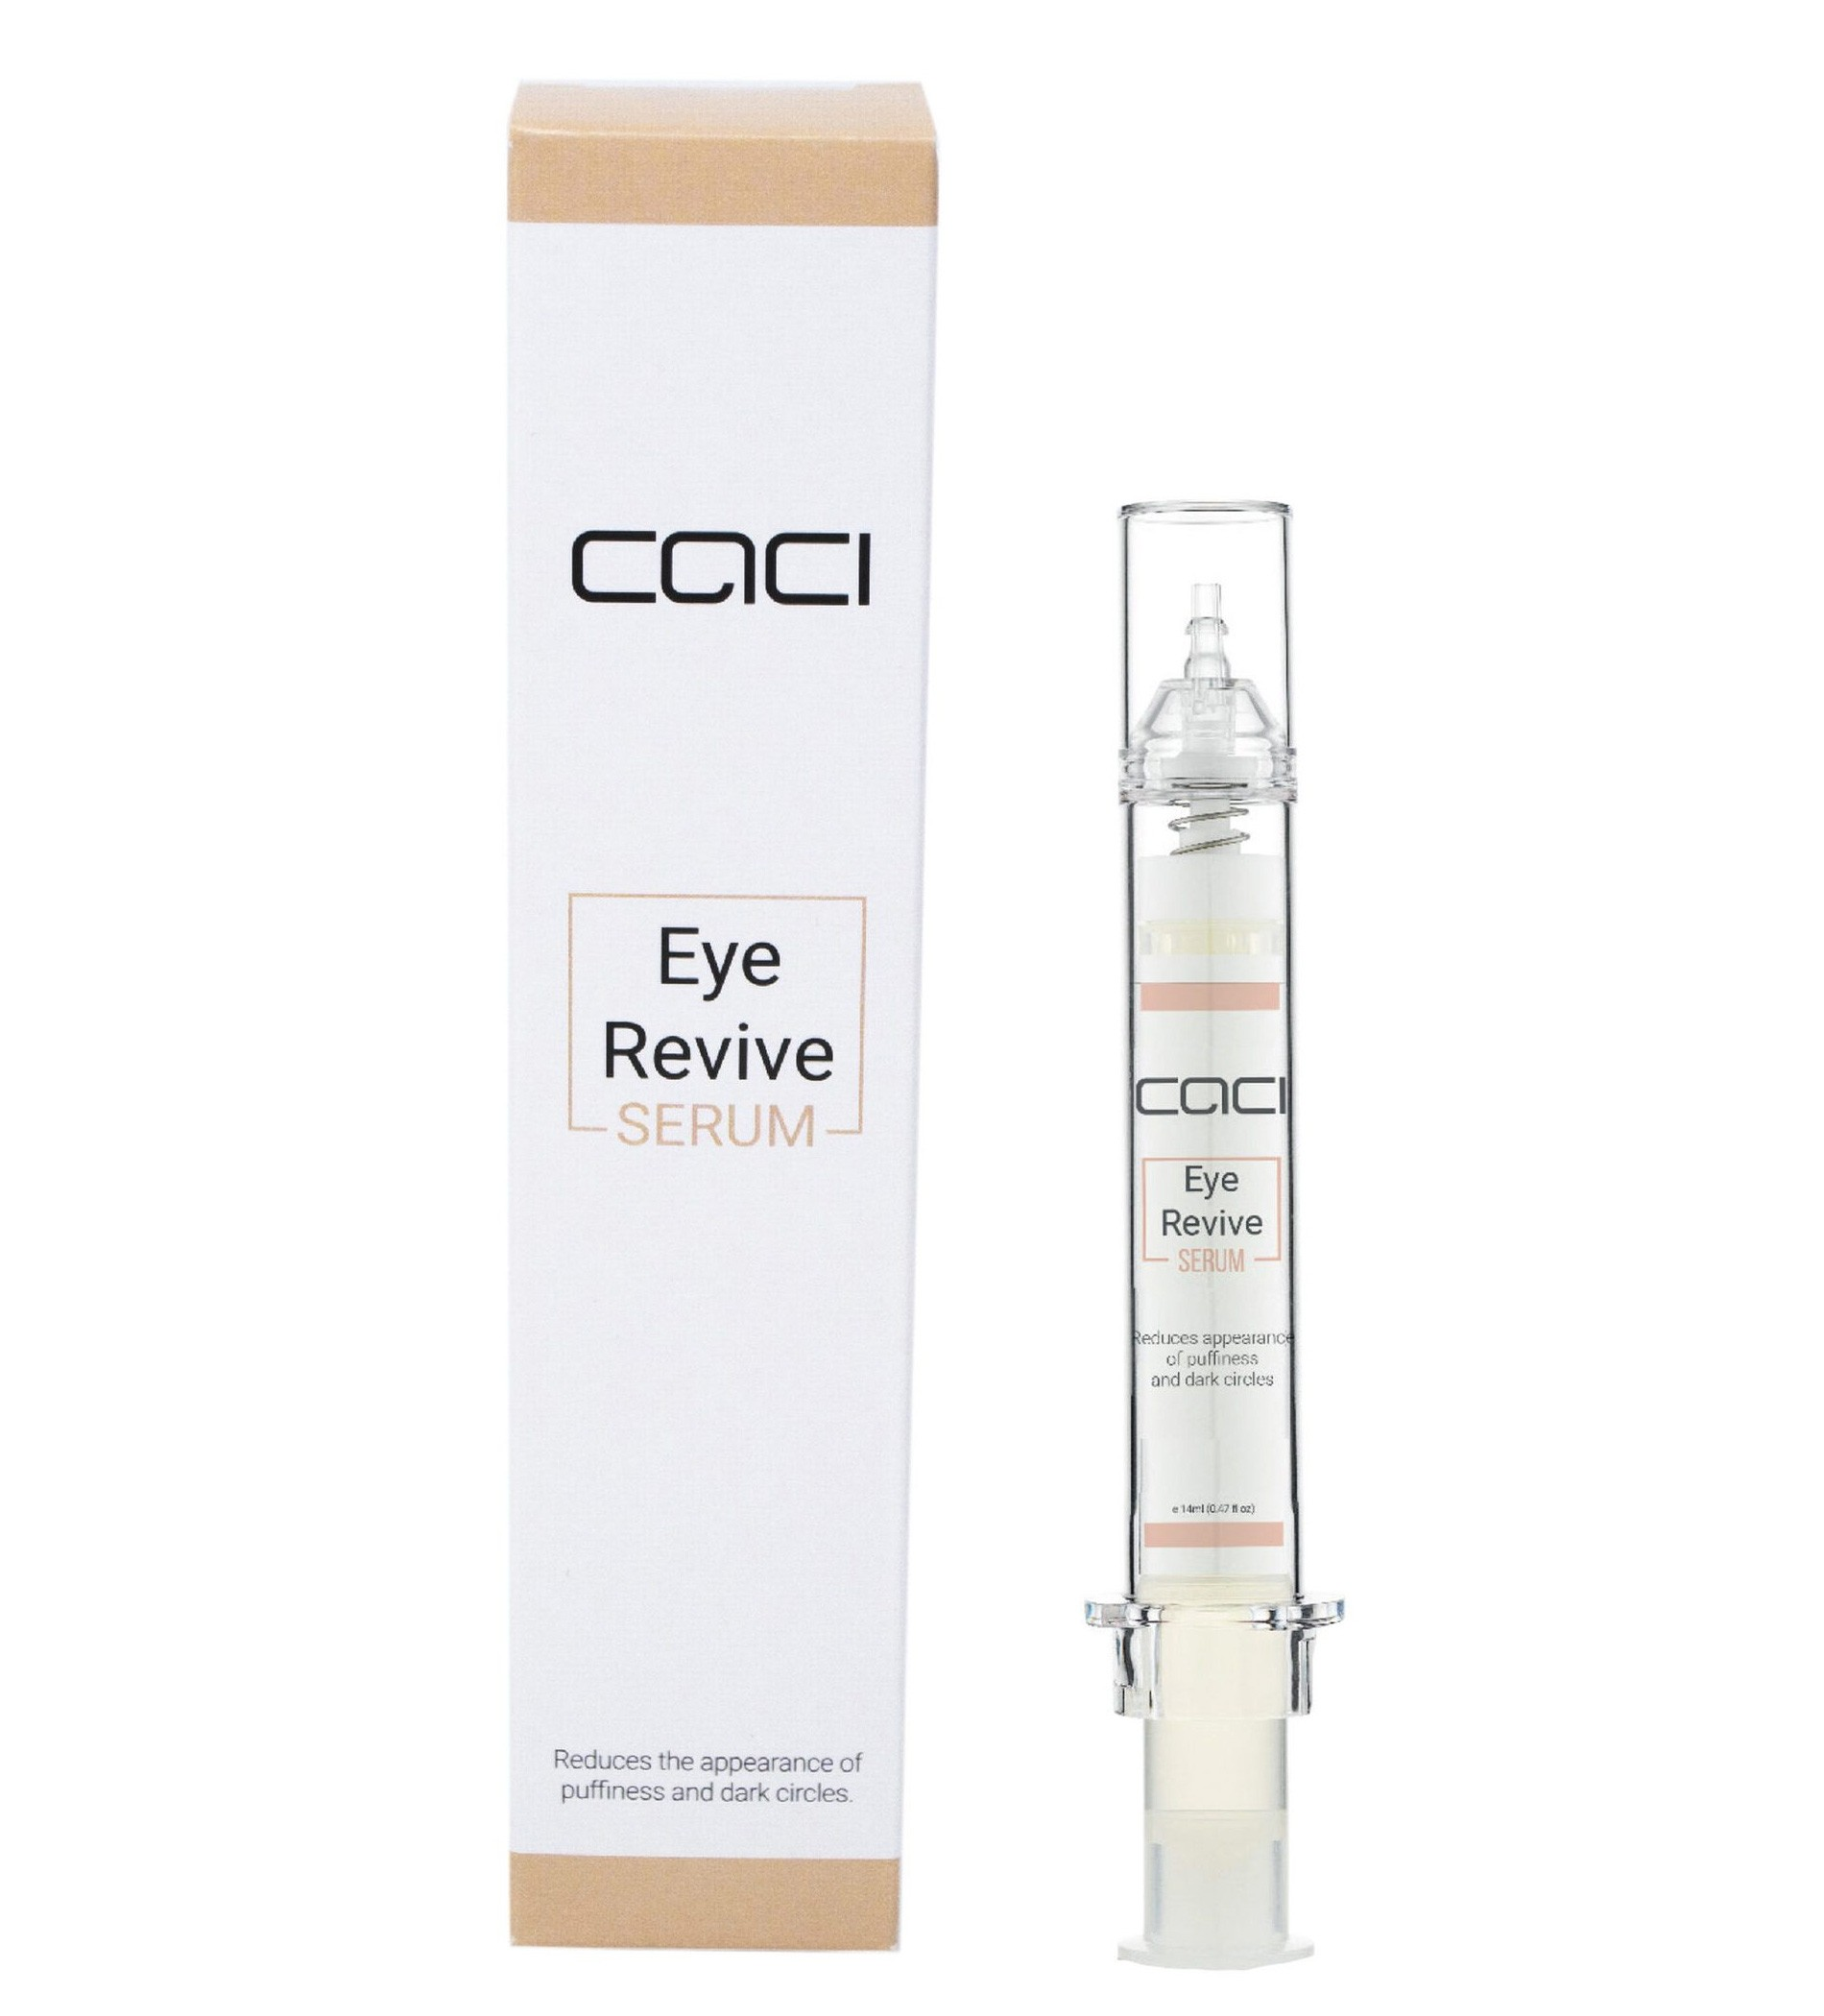 Caci Eye Revive Serum Anti-ageing